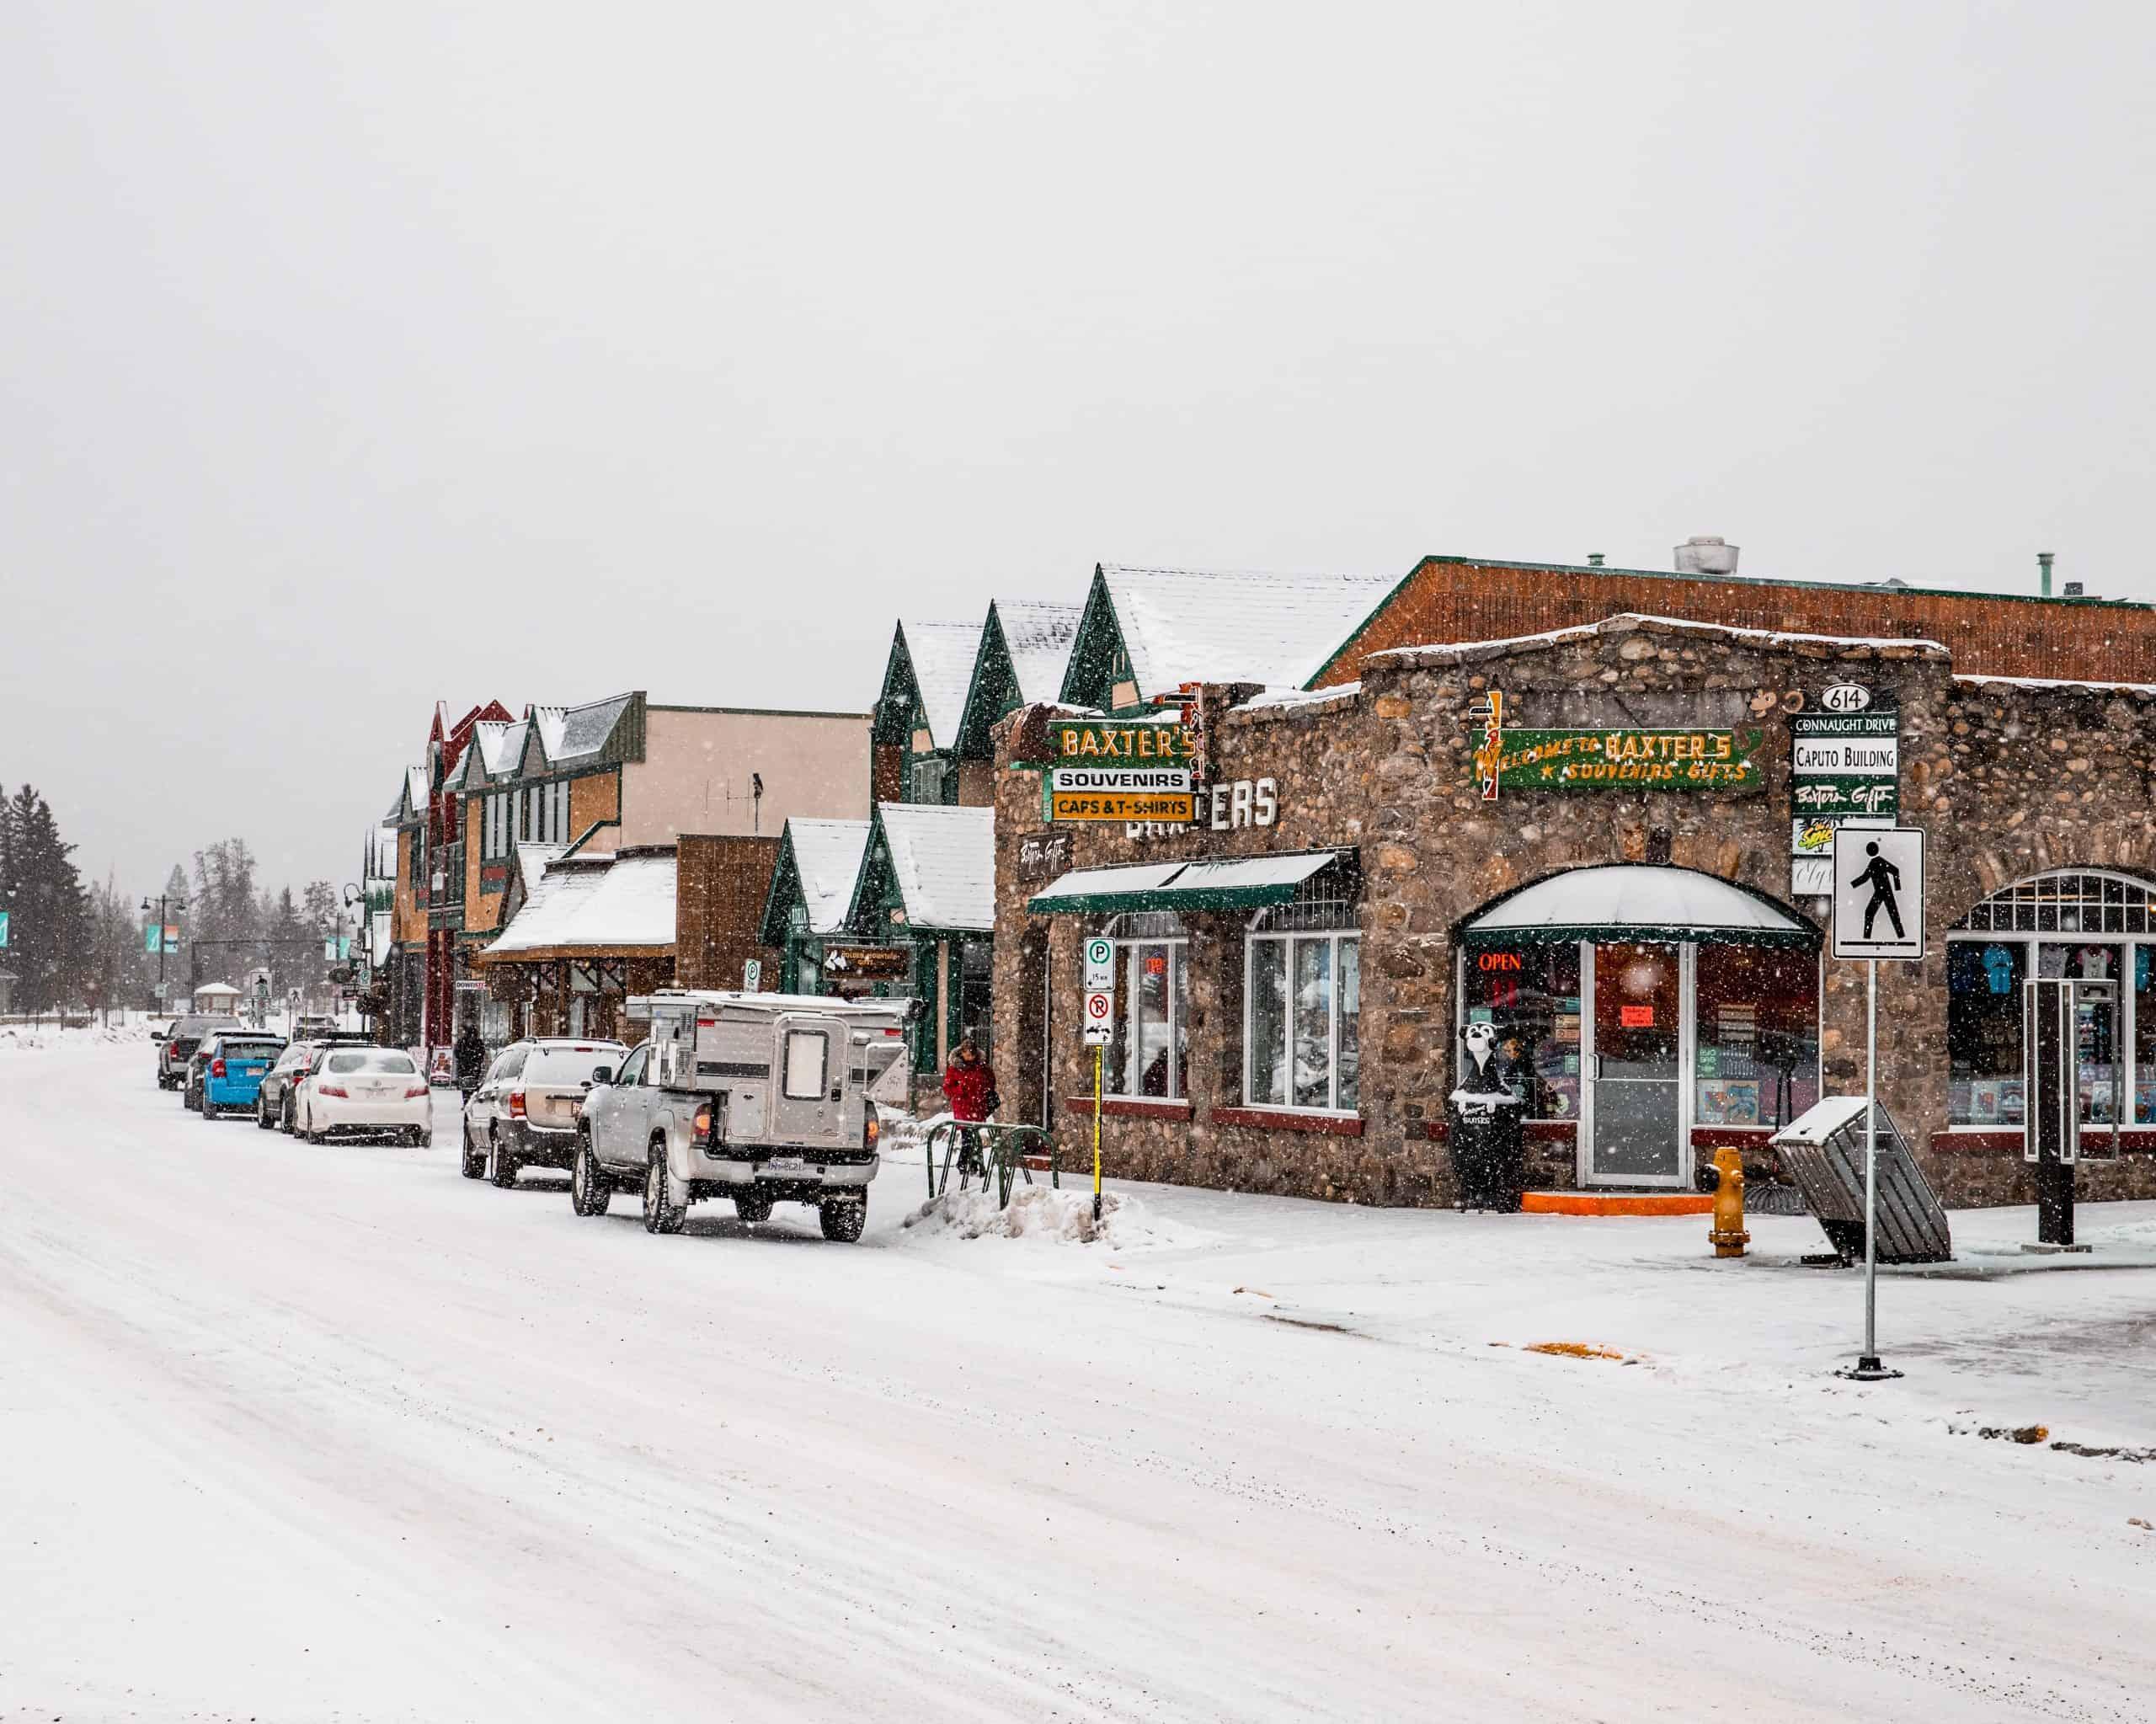 Snow-covered Jasper in Winter